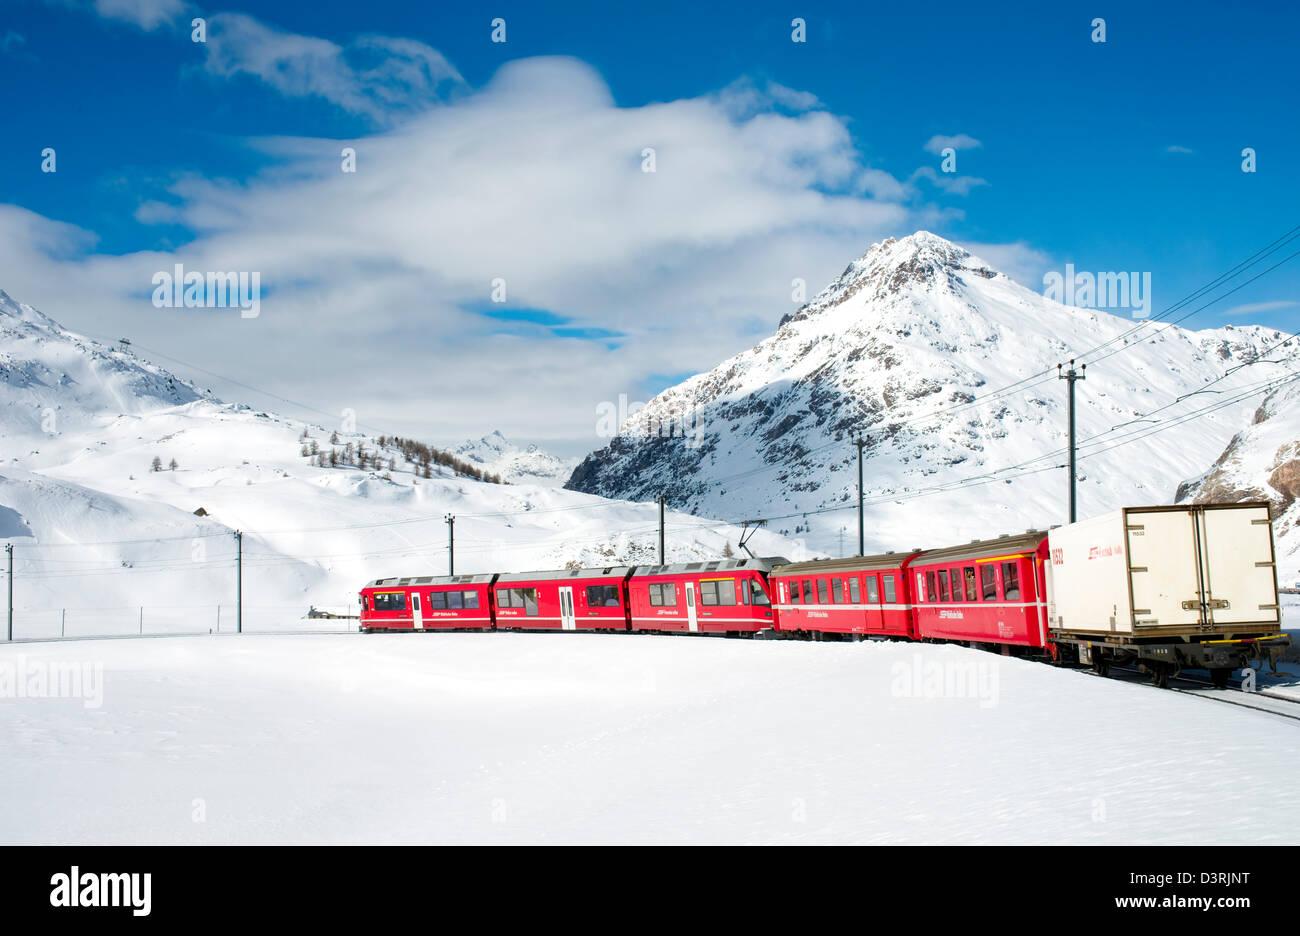 Bergbahn am Lago Bianco-Bernina-Pass im Winter, Graubünden, Schweiz | Eisenbahn bin Lago Bianco bin Bernina Stockbild